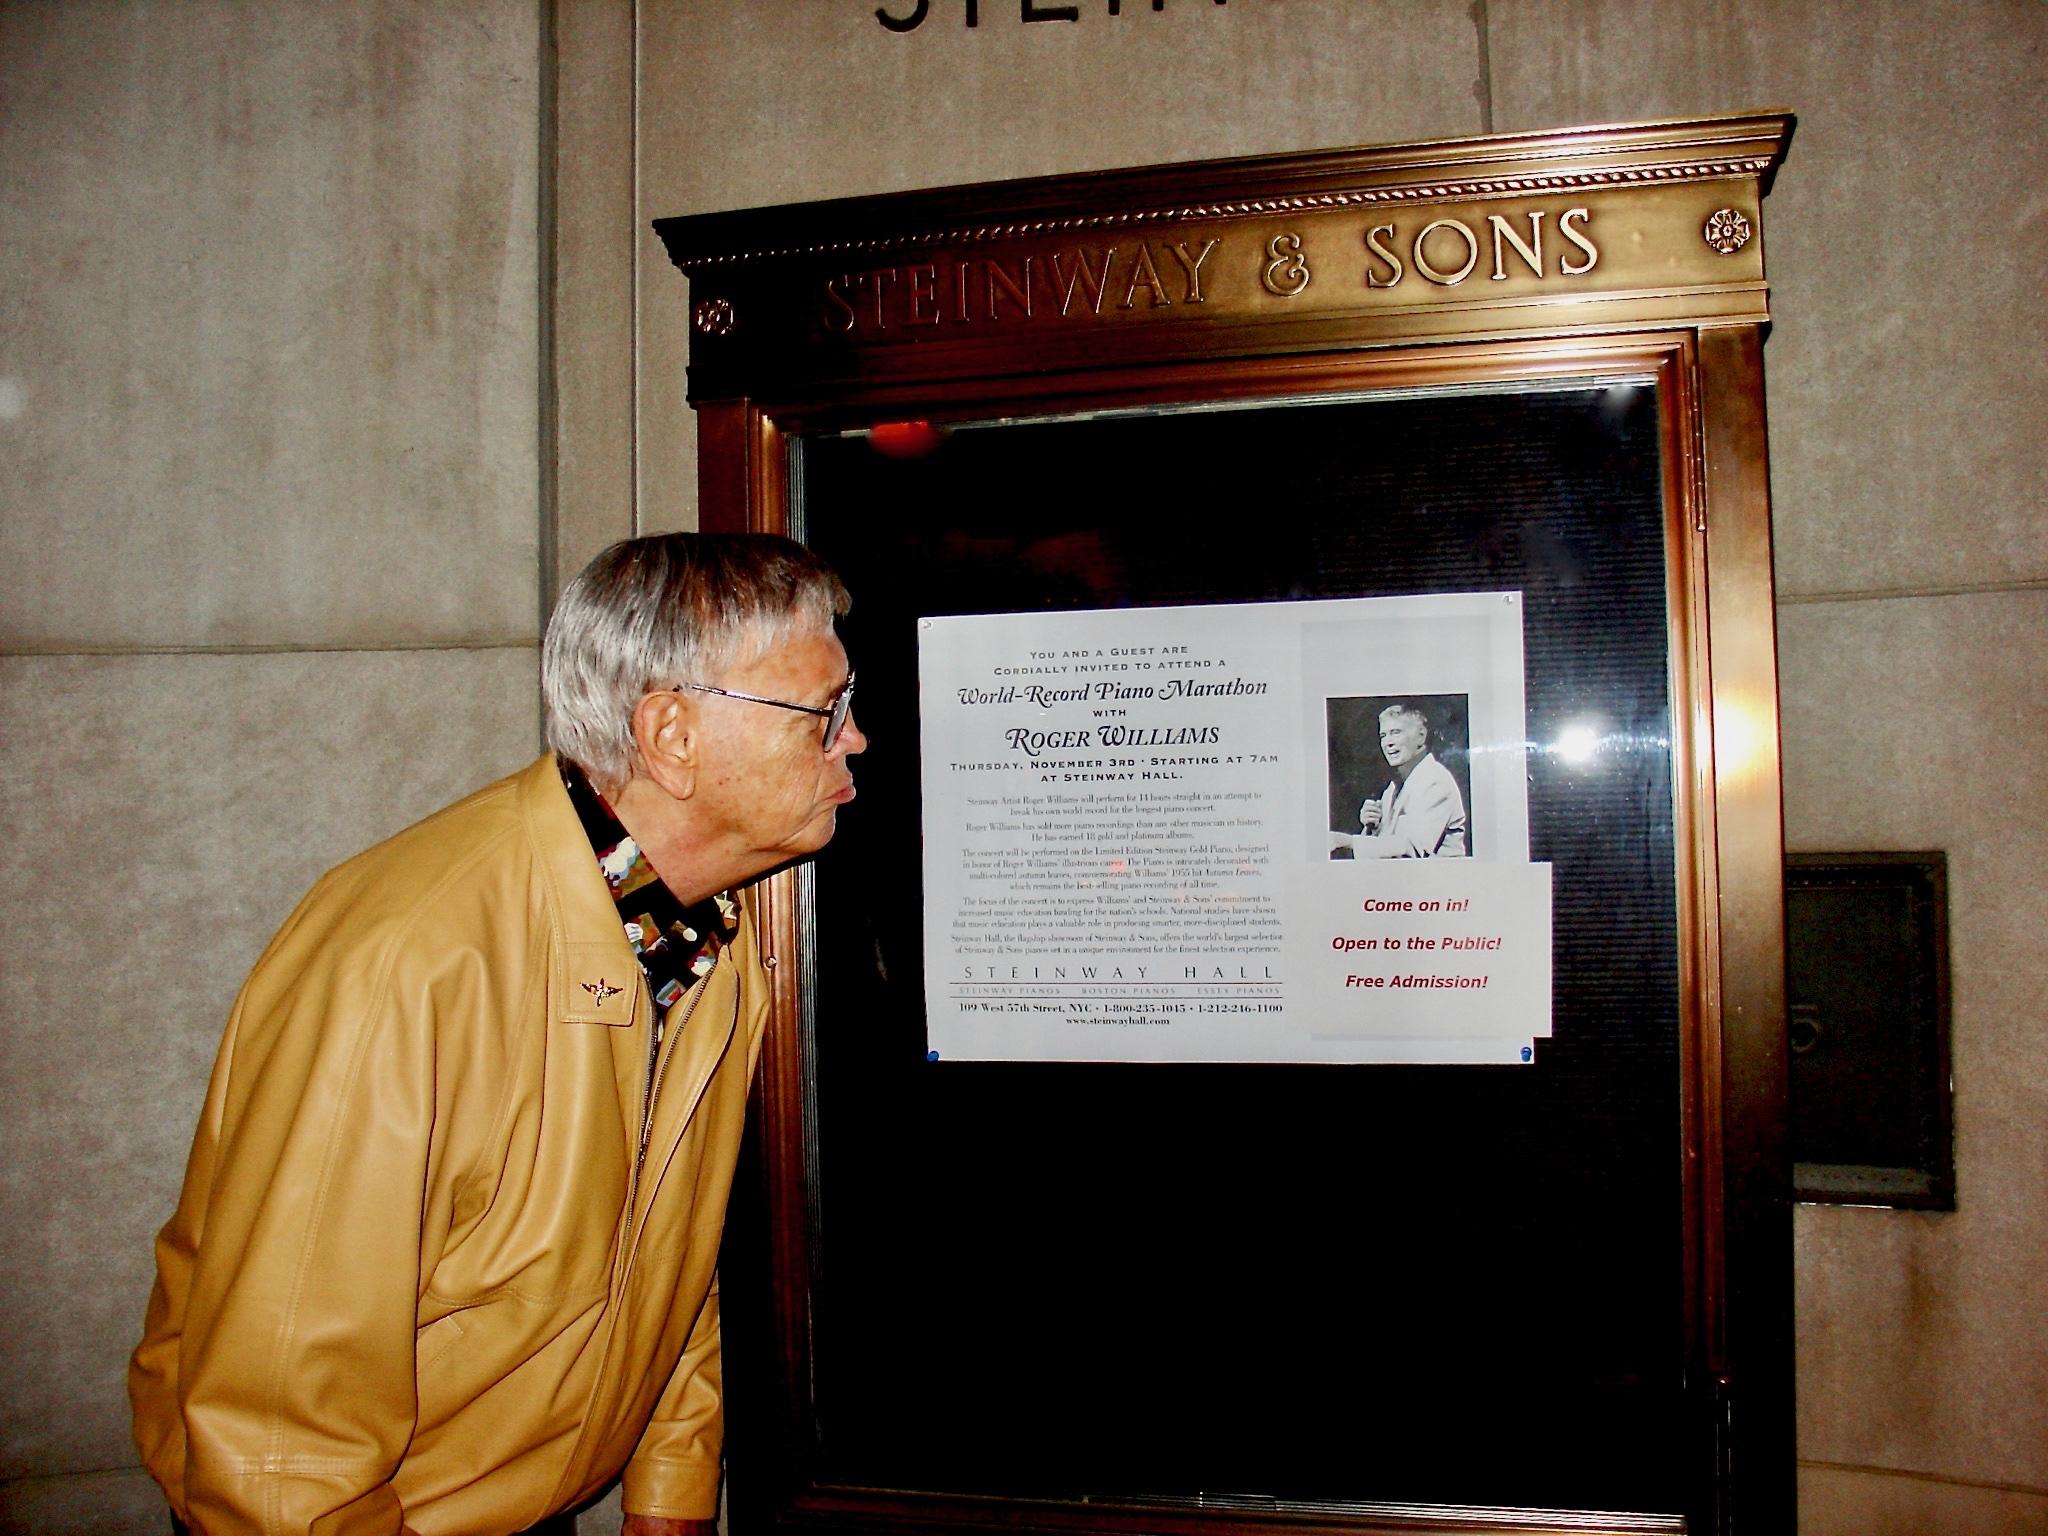 Roger acting playful before his marathon at NY Steinway Hall